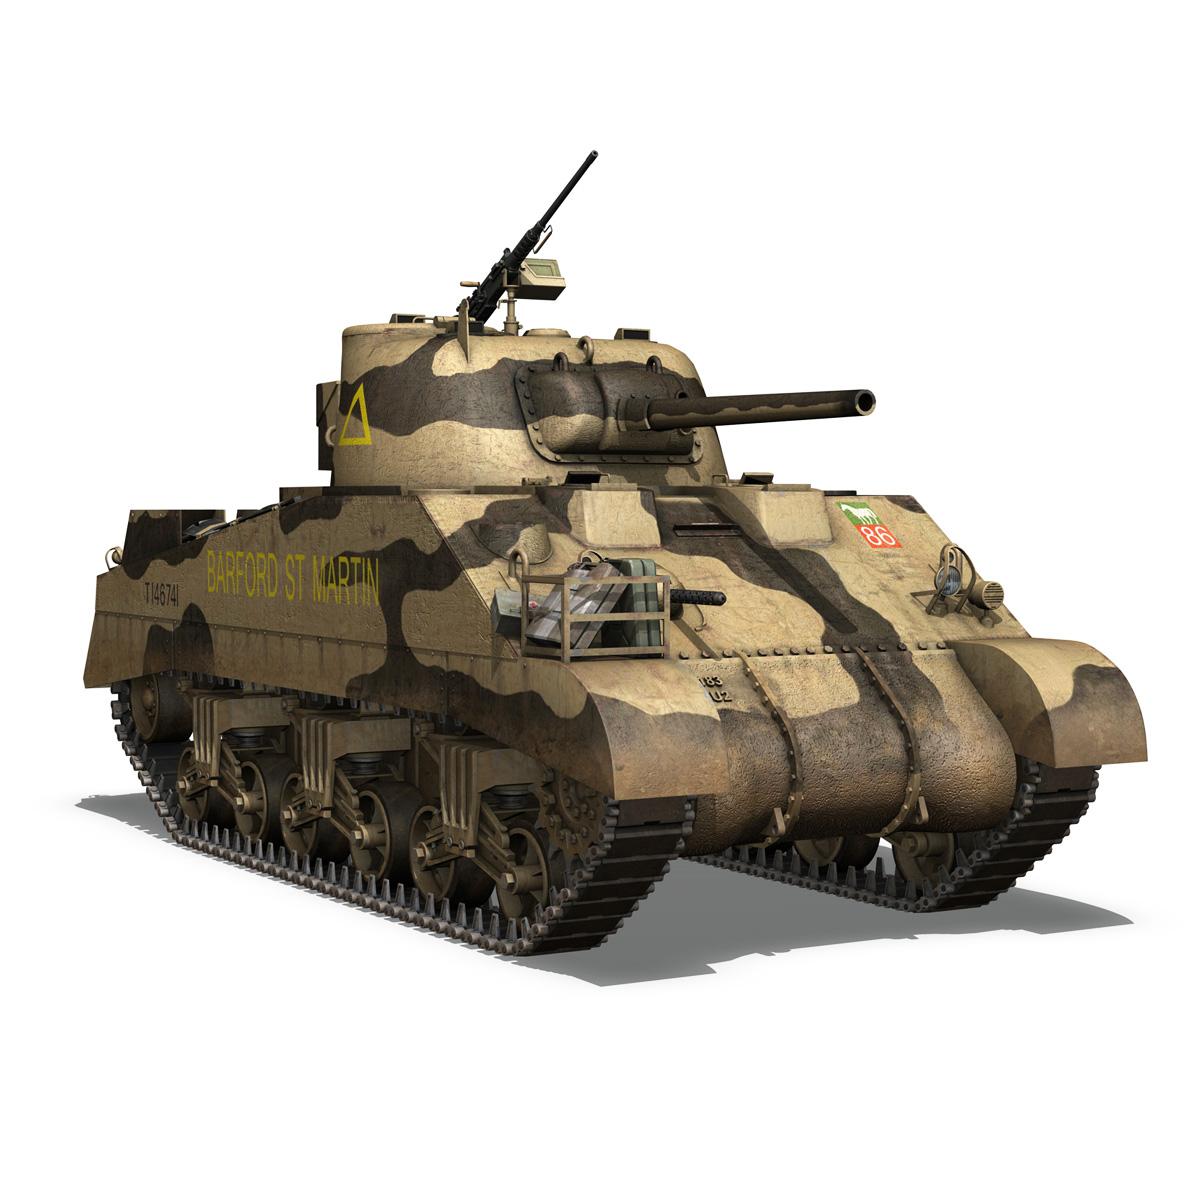 M4 Sherman MK.III - Barford St Martin 3d model  266957